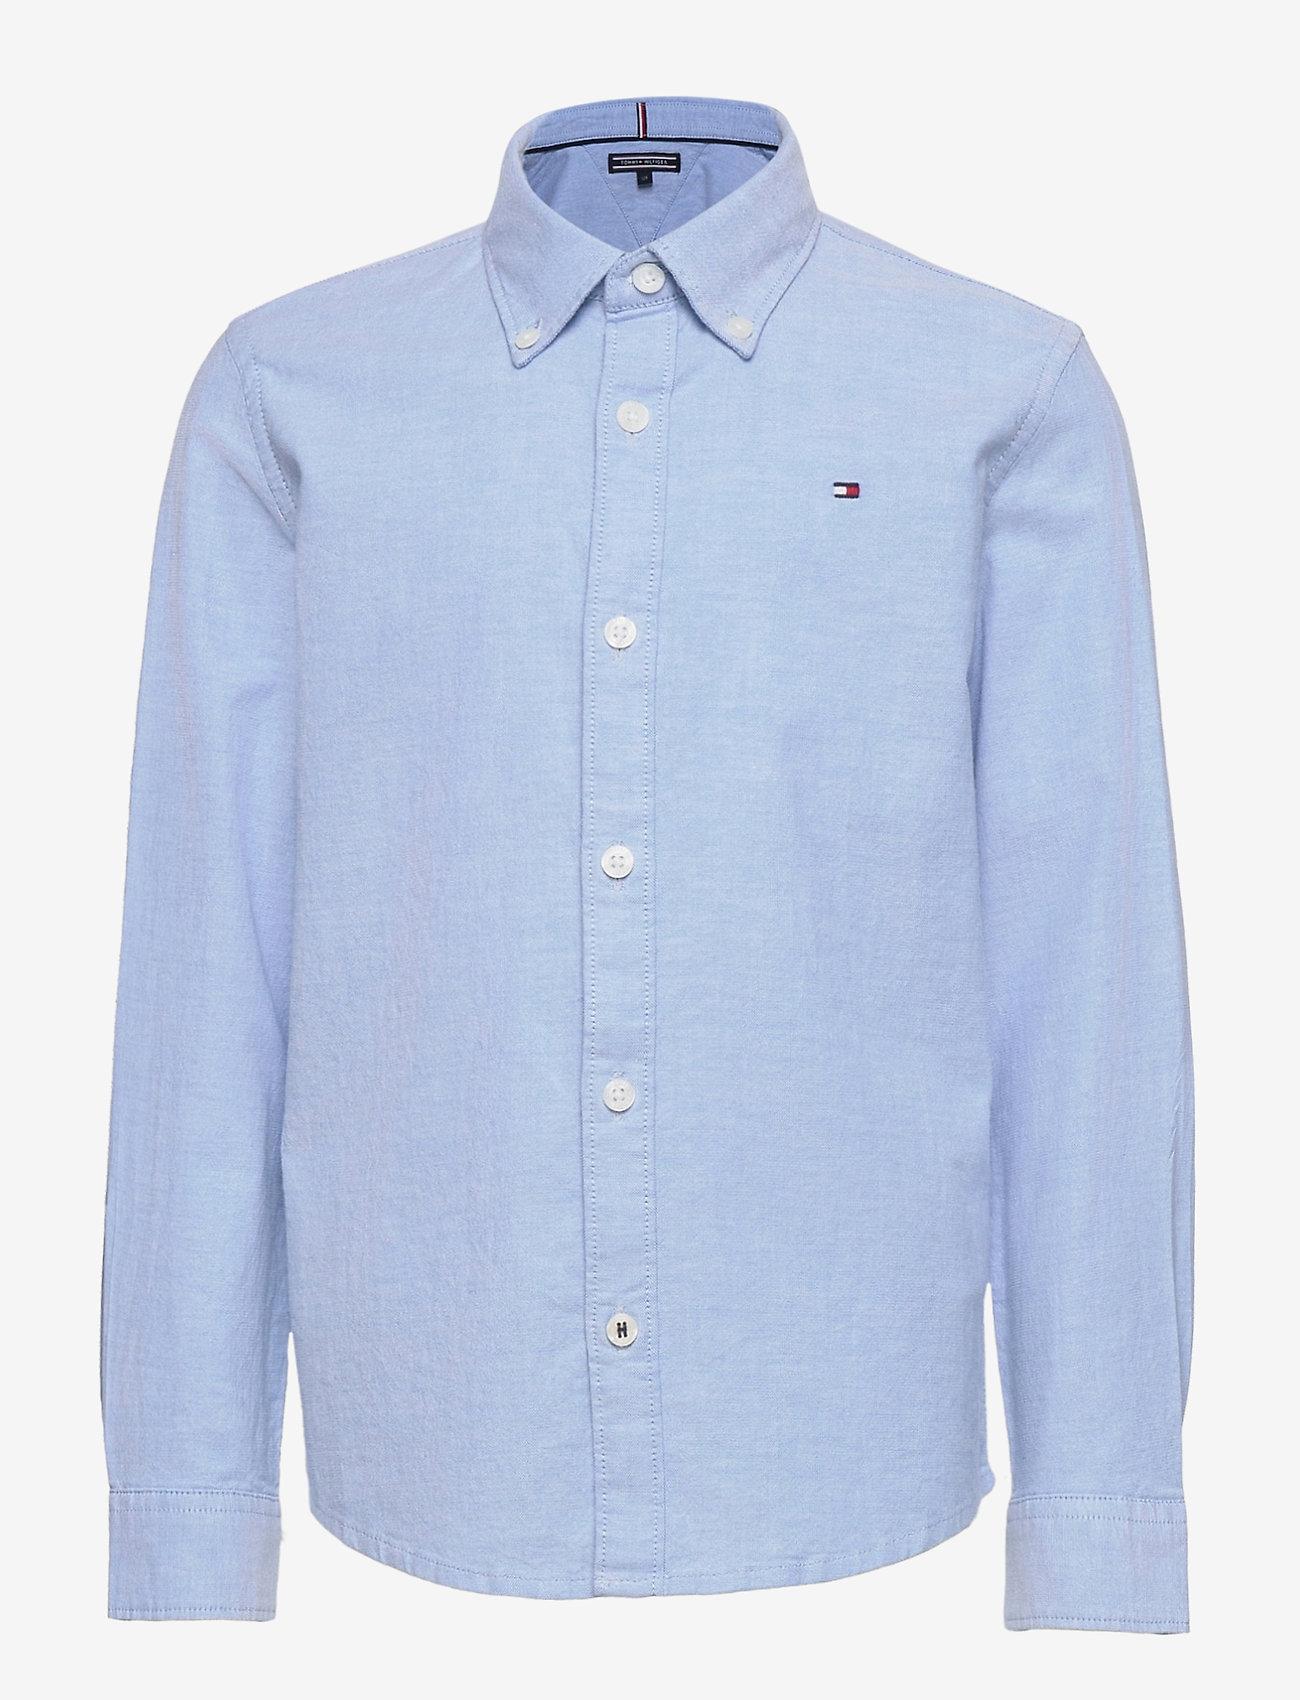 Tommy Hilfiger - BOYS STRETCH OXFORD SHIRT L/S - shirts - shirt blue - 0